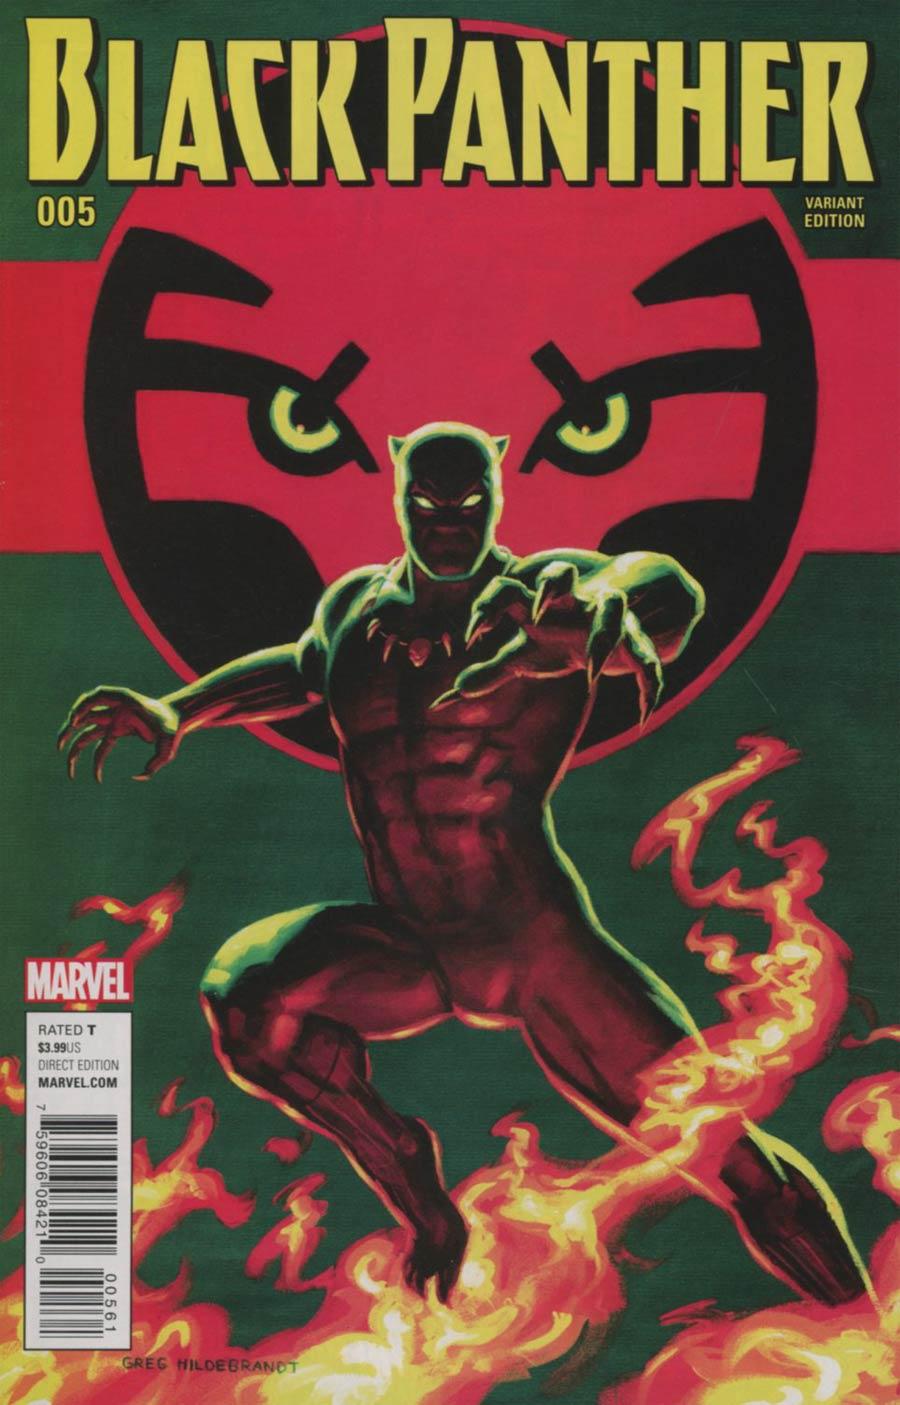 Black Panther Vol 6 #5 Cover G Incentive Greg Hildebrandt Classic Artist Variant Cover